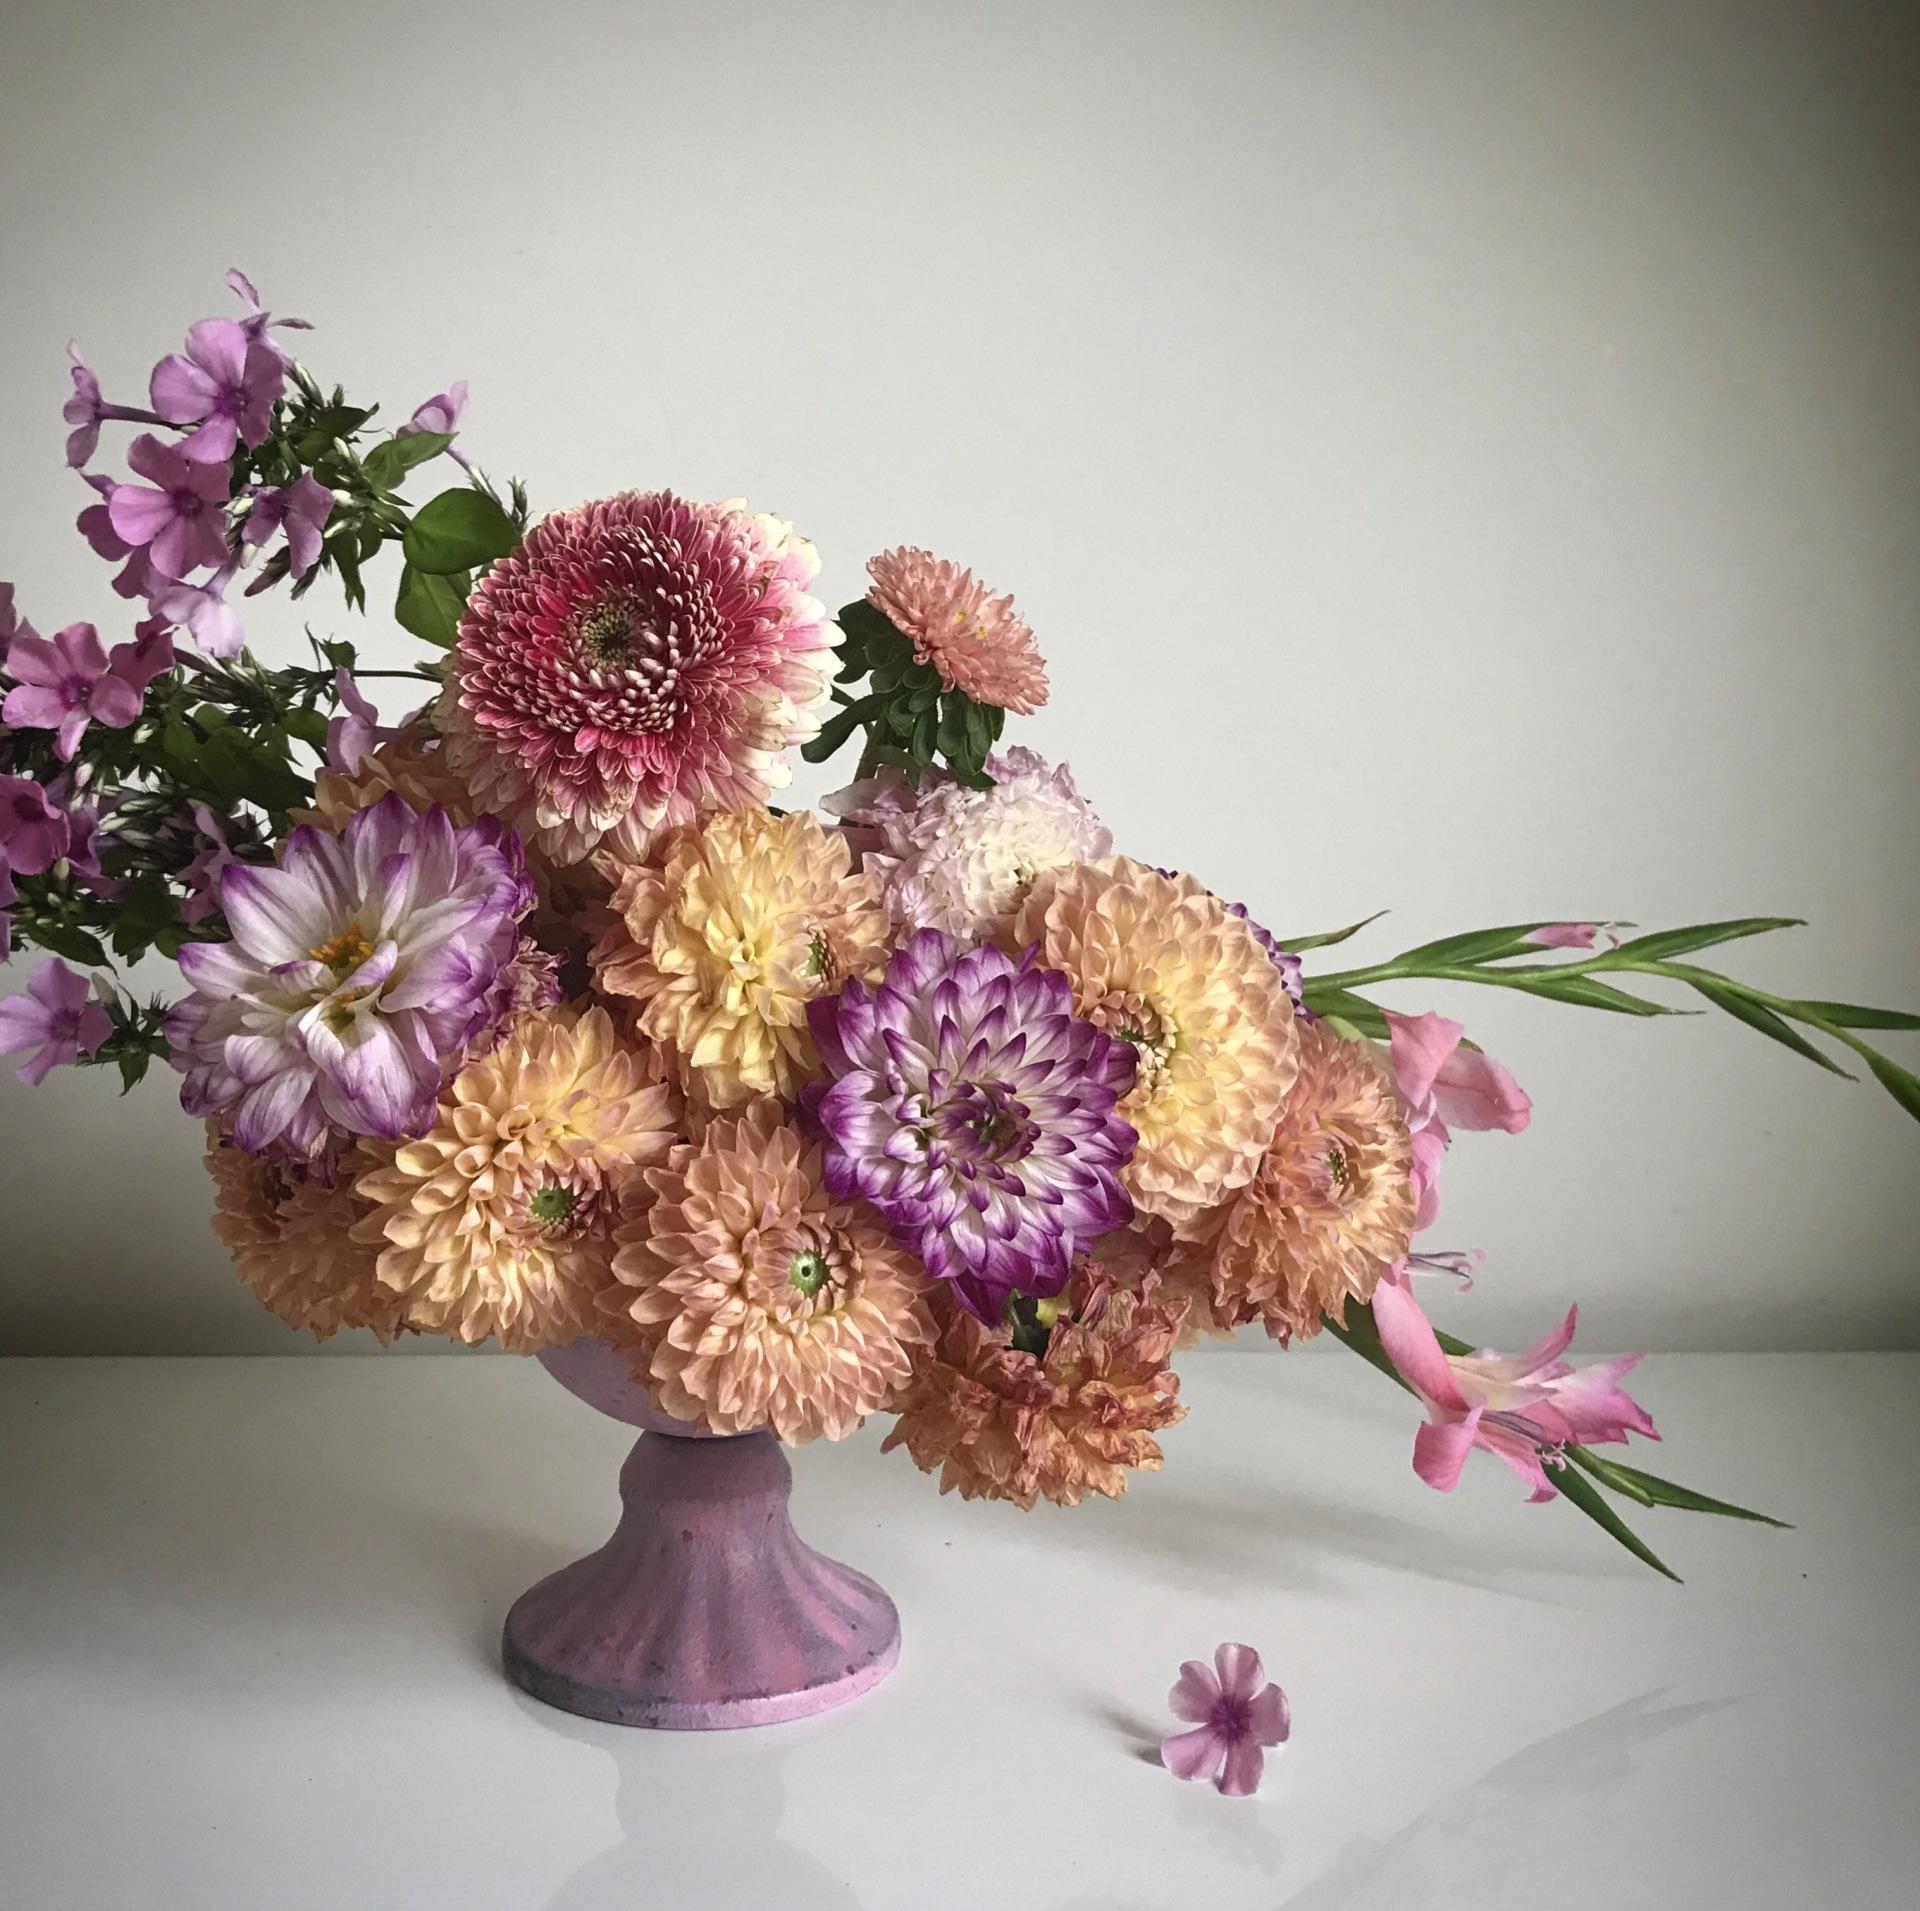 Dahlia centrepiece | table centrepiece | london florist | luxury london florist | wedding flowers | dahlia bouquet | shilpa reddy flowers | shilpa reddy florist | shilpa reddy |